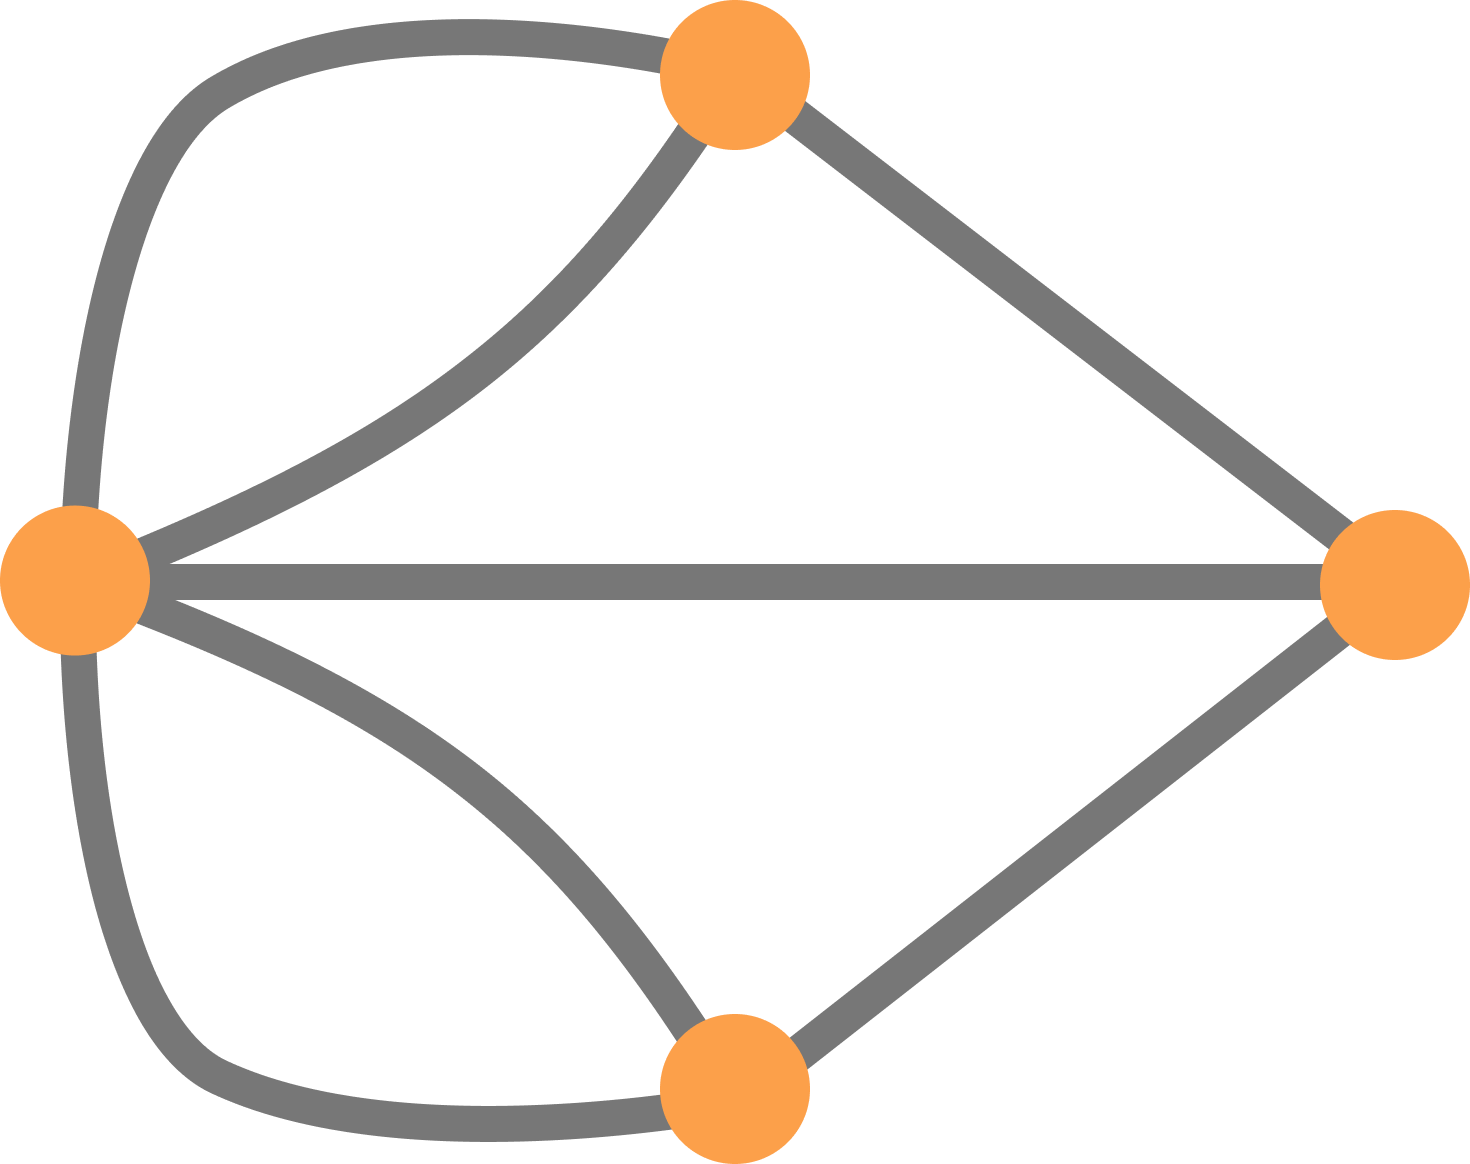 Eulerian brilliant math science. Path clipart right path